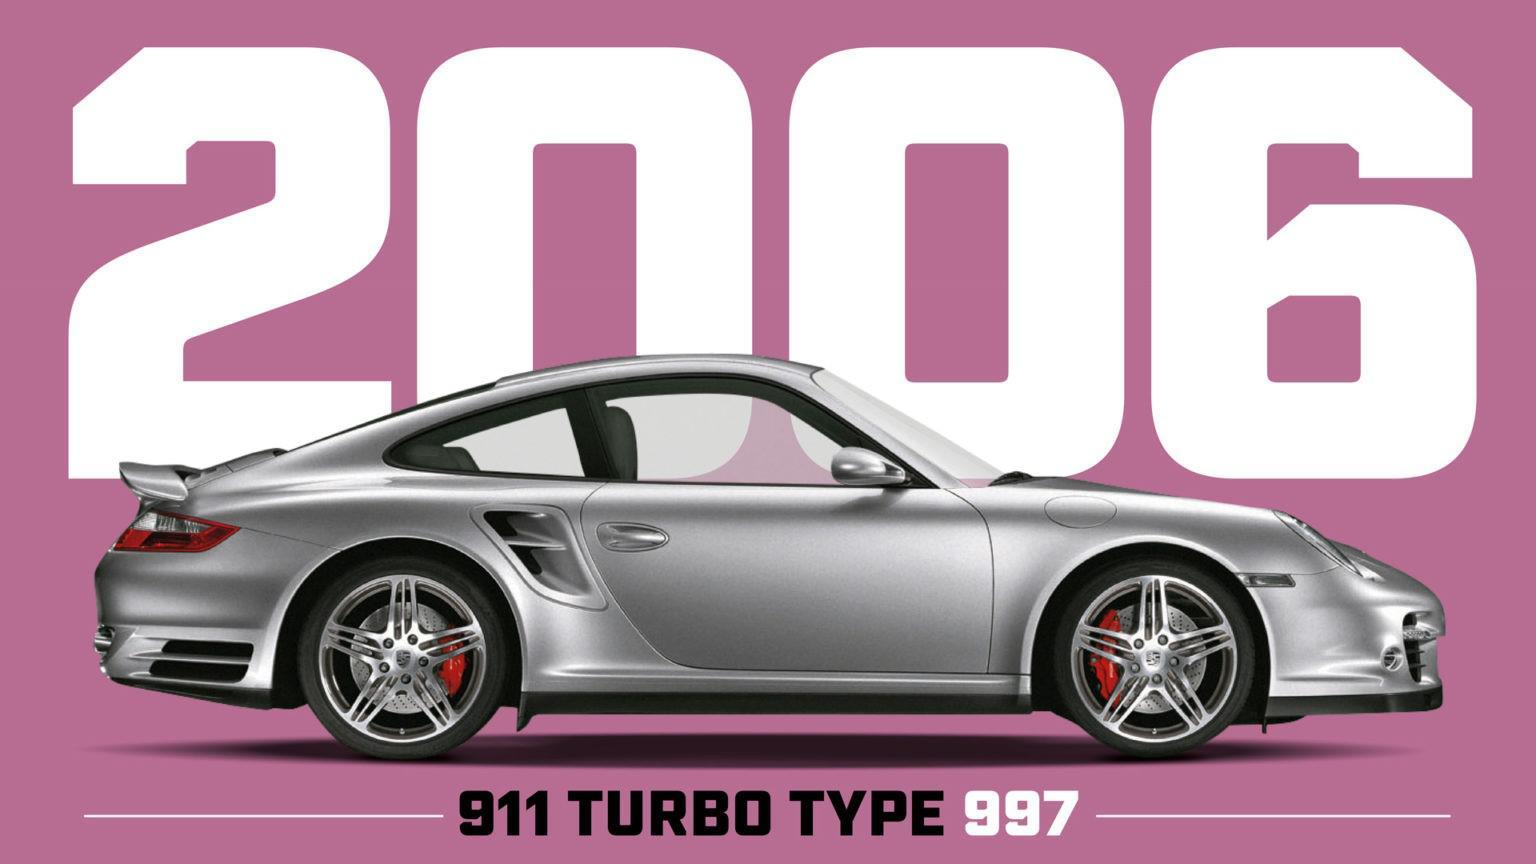 la-saga-porsche-911-turbo-le-guide-d-achat-1349-5.jpg